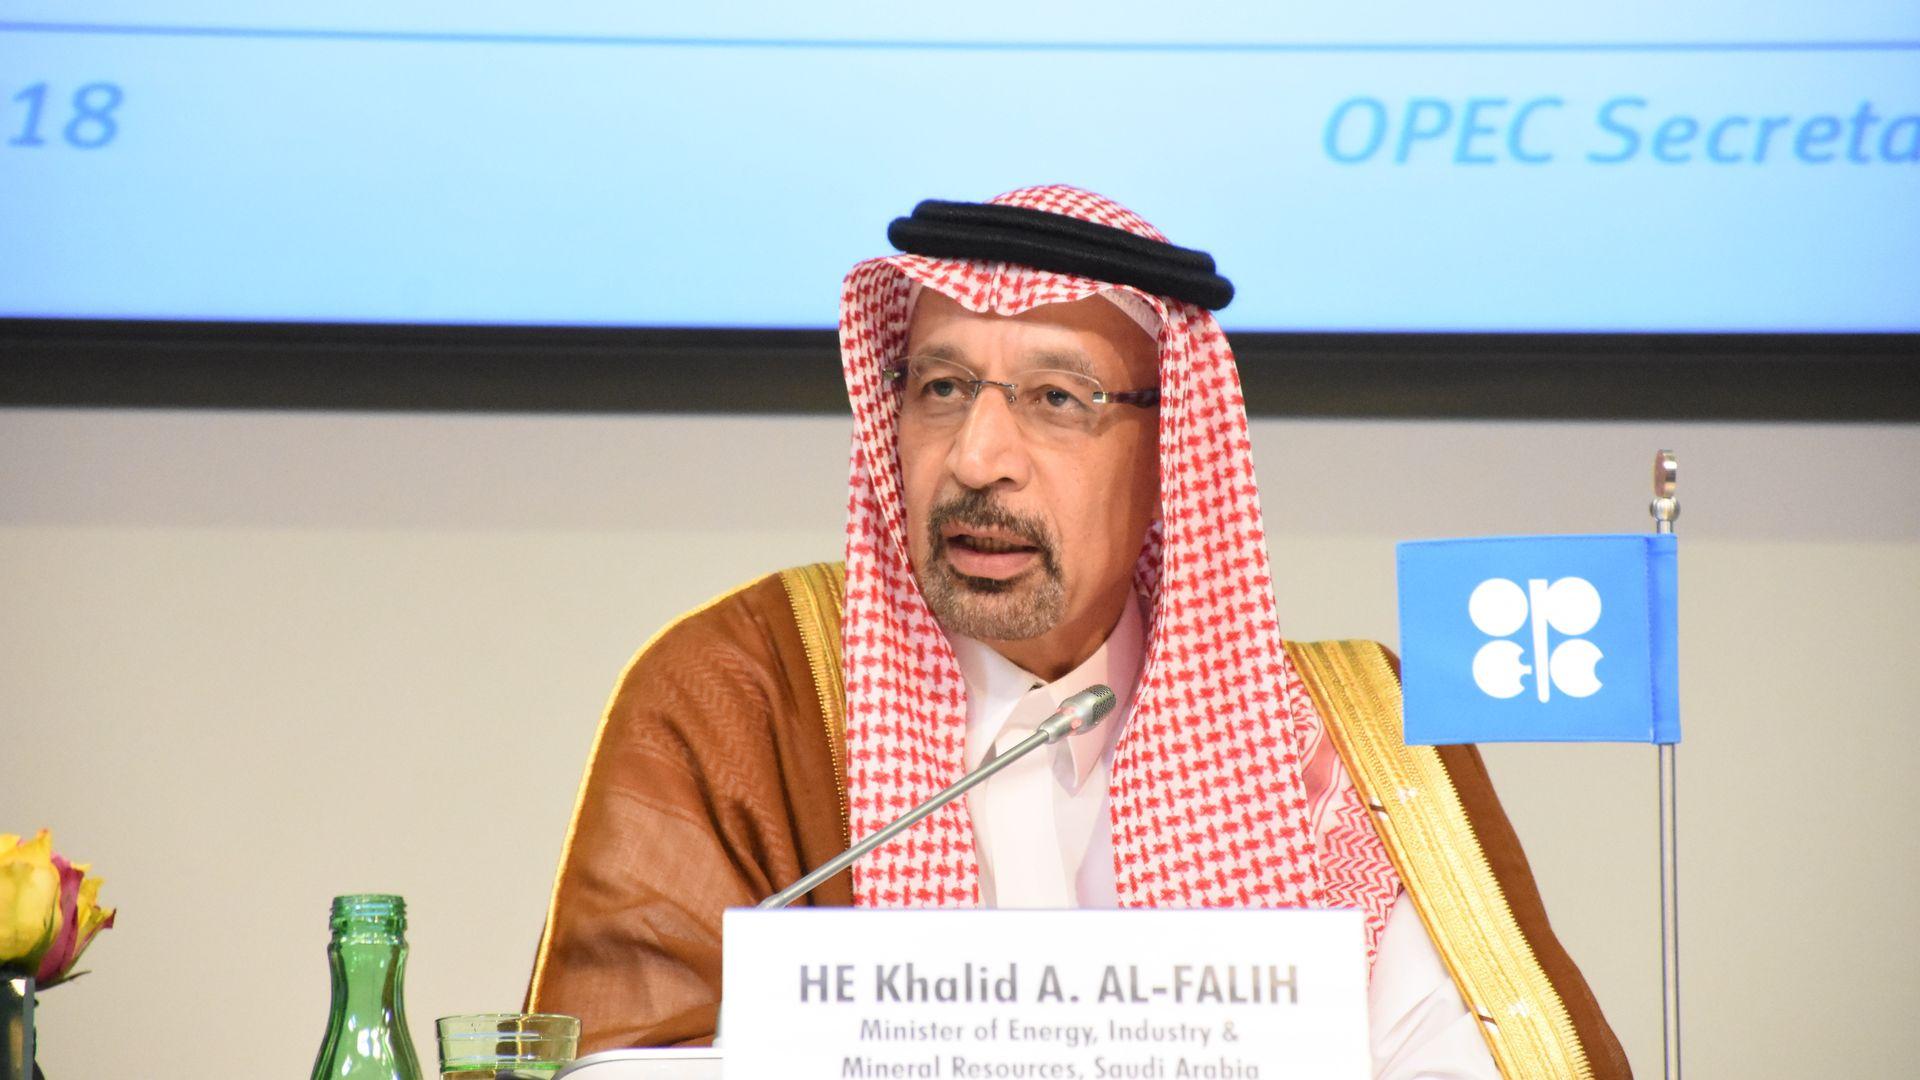 Saudi energy minister